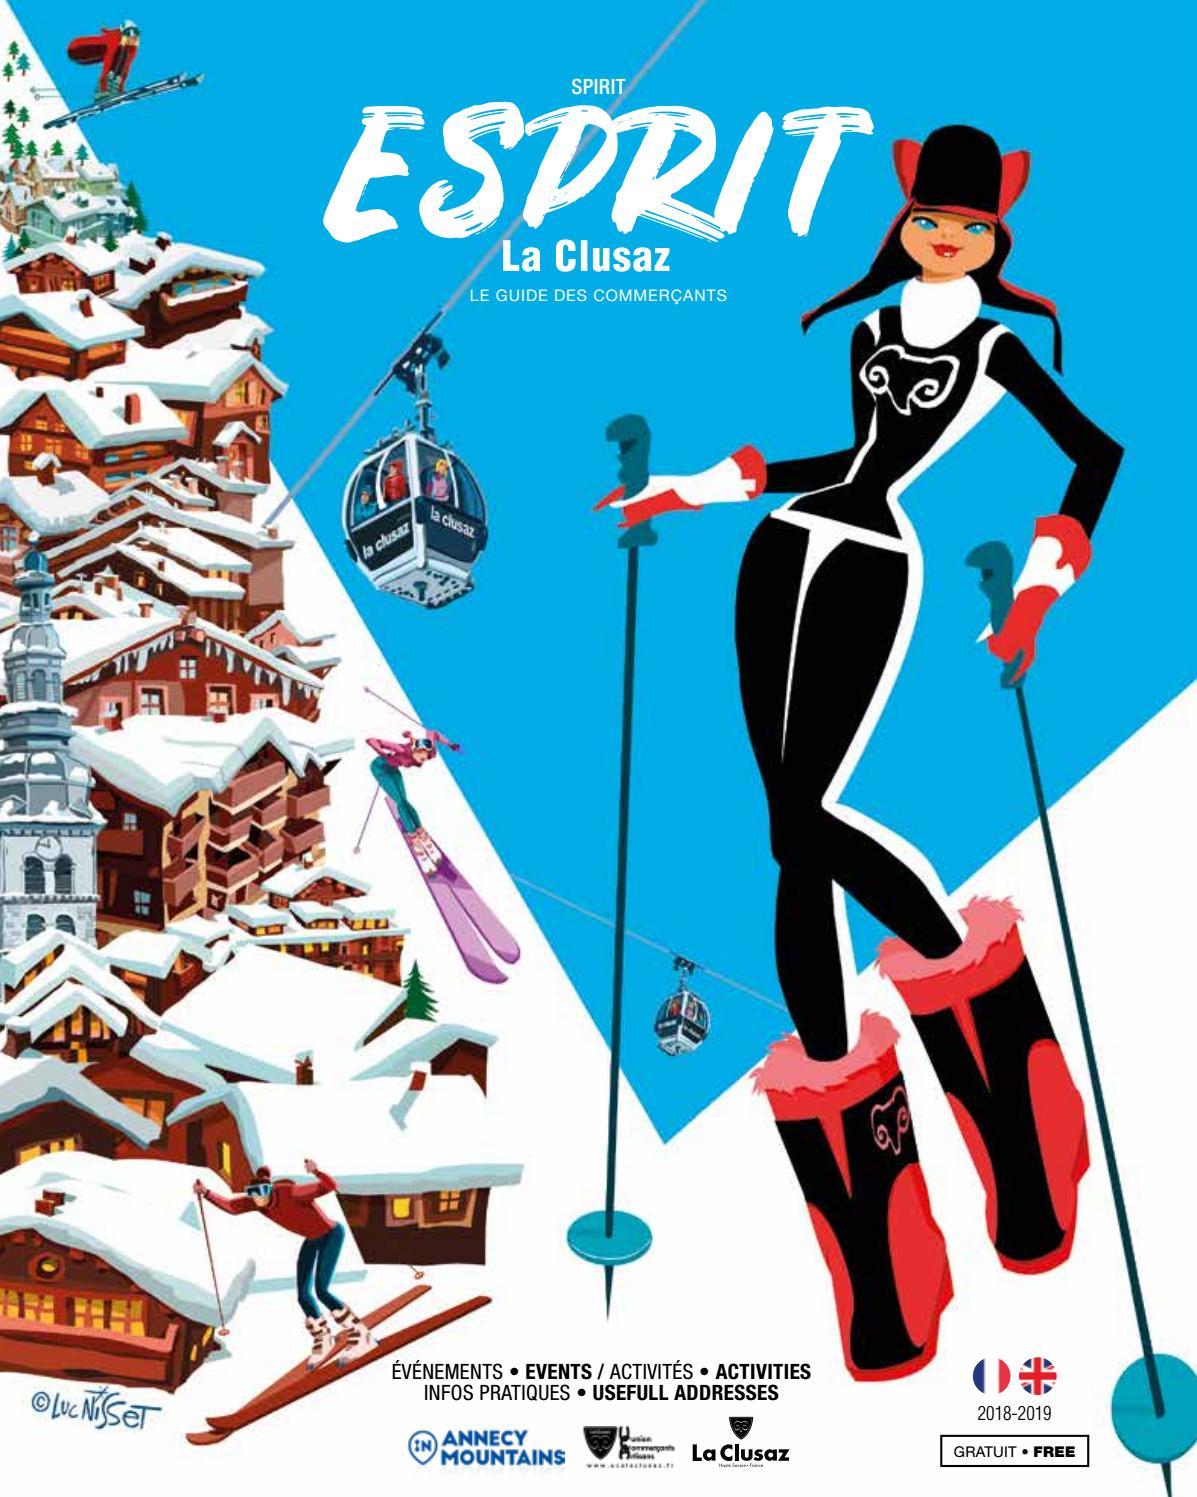 Éditions Clusaz Issuu La By Esprit Cosy Tc3uJ5lKF1